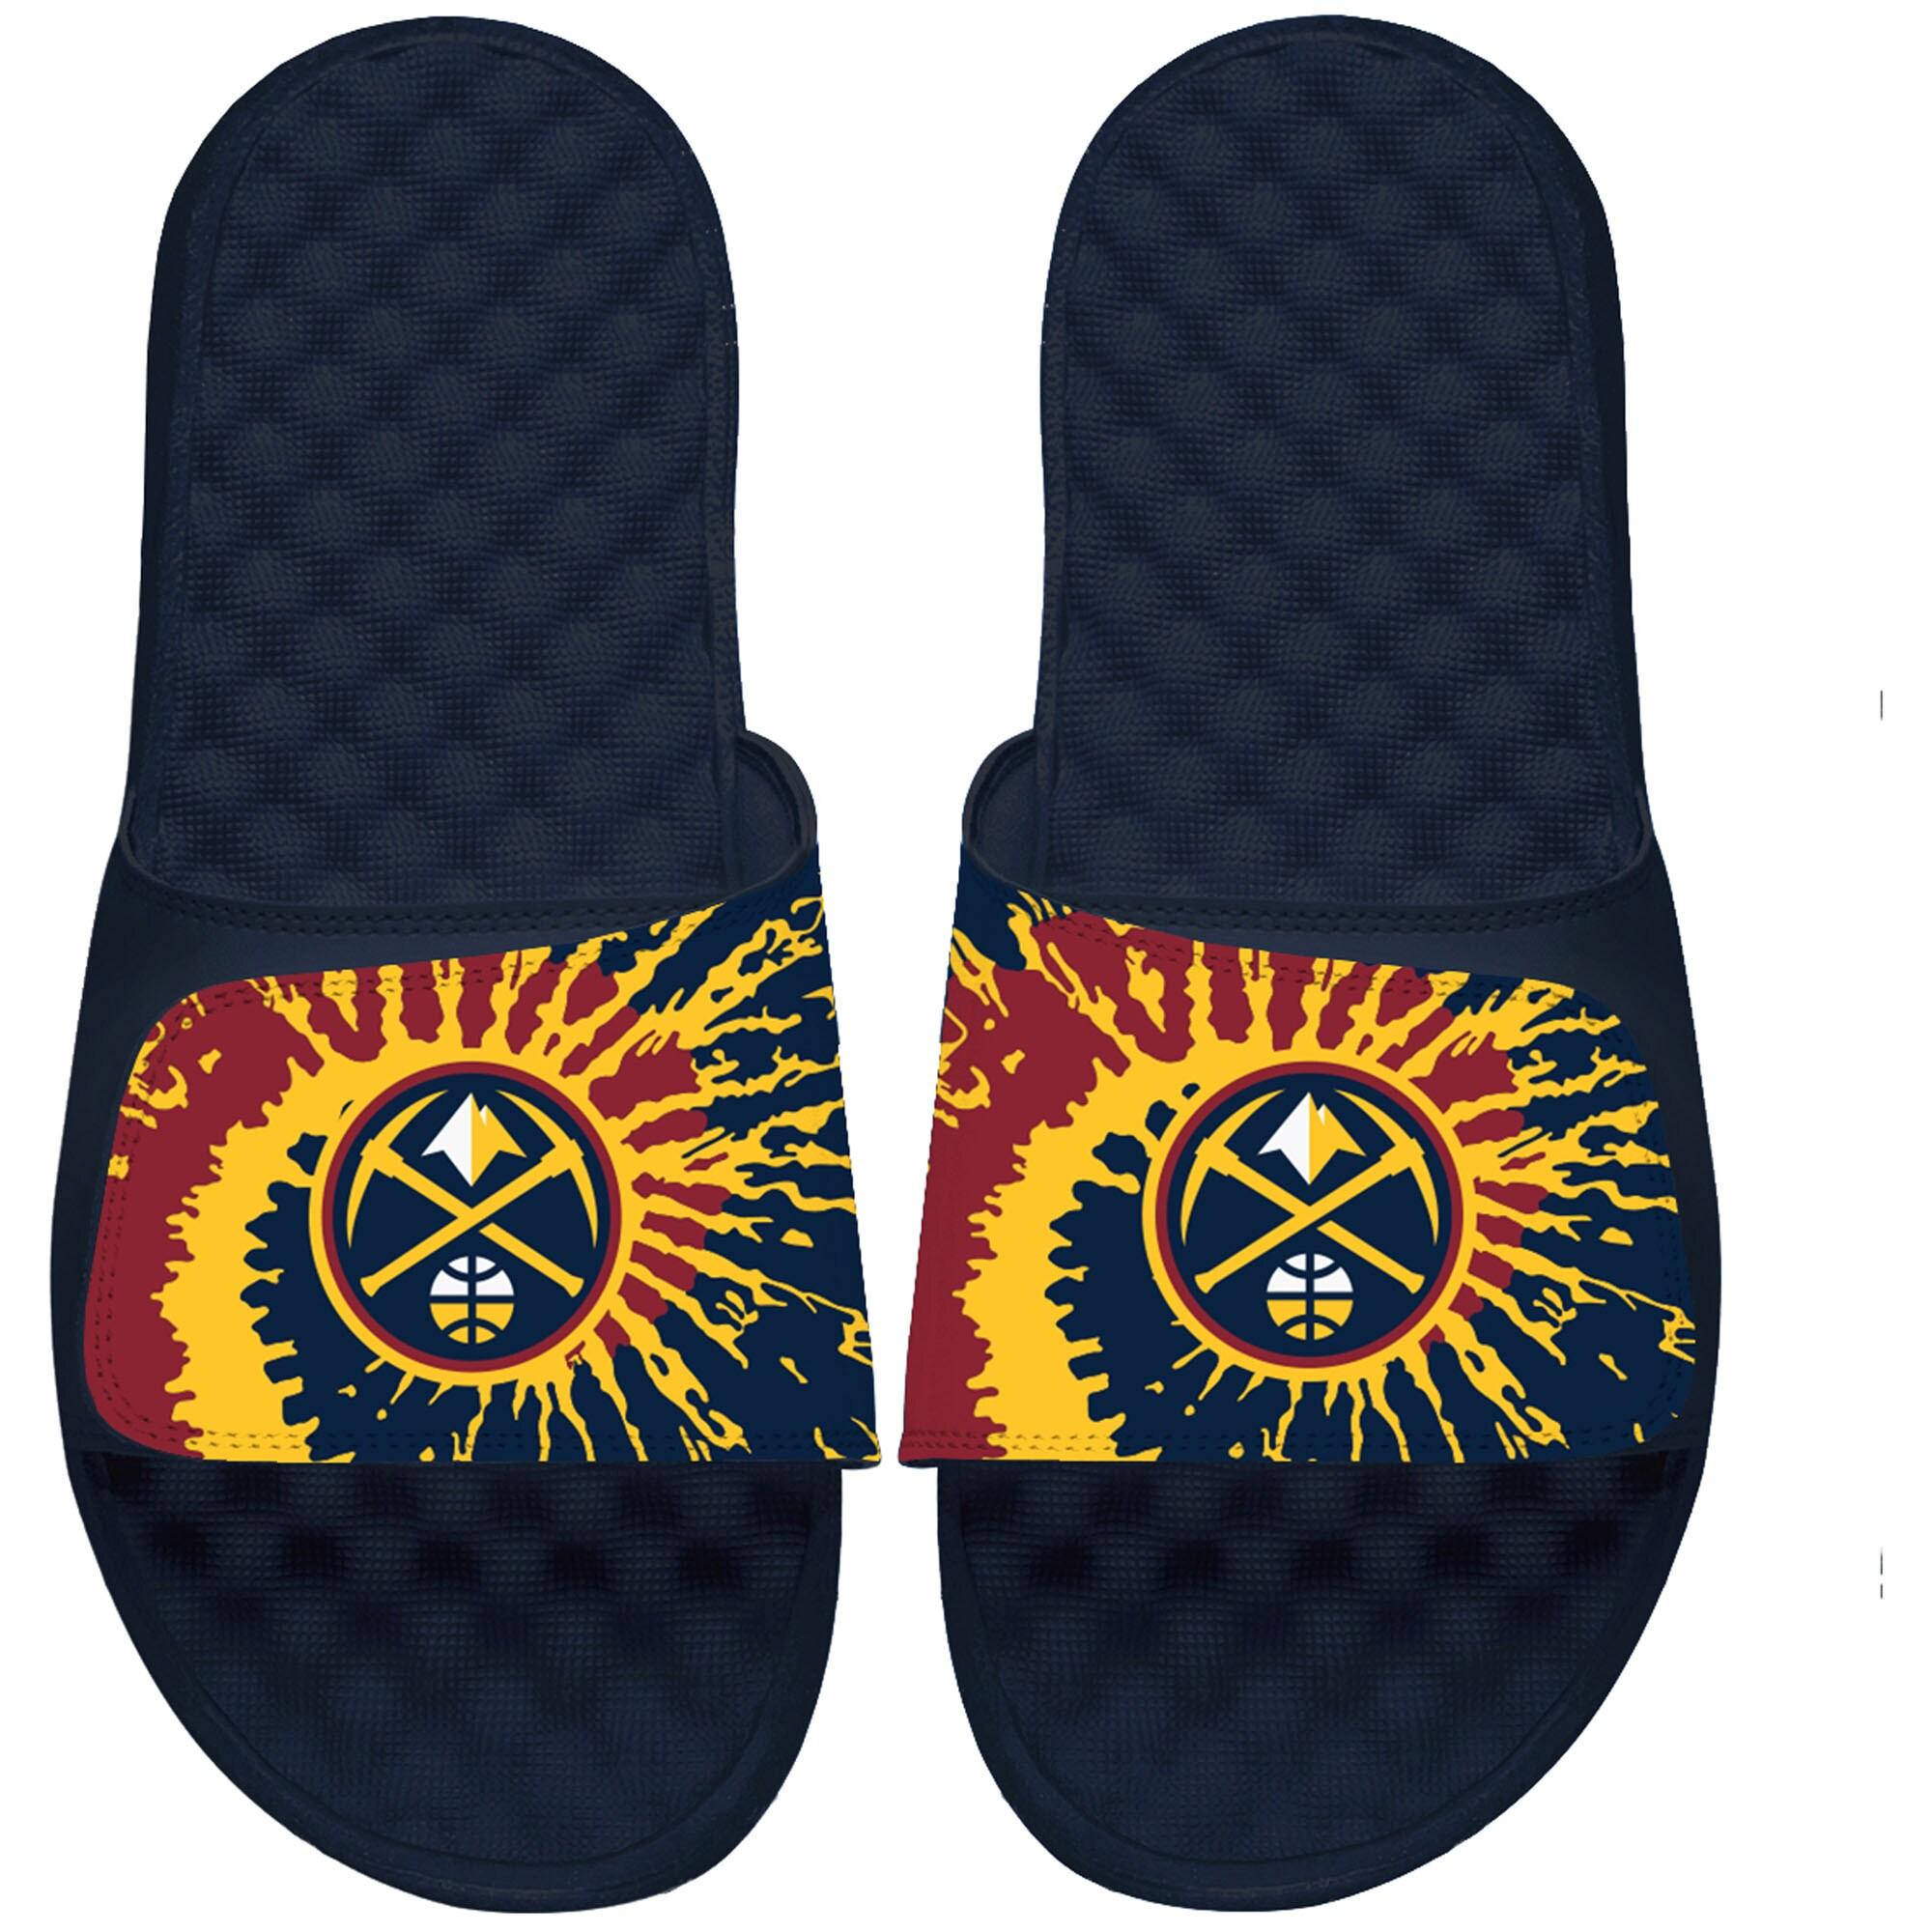 Denver Nuggets ISlide Youth Tie Dye Slide Sandals - Navy